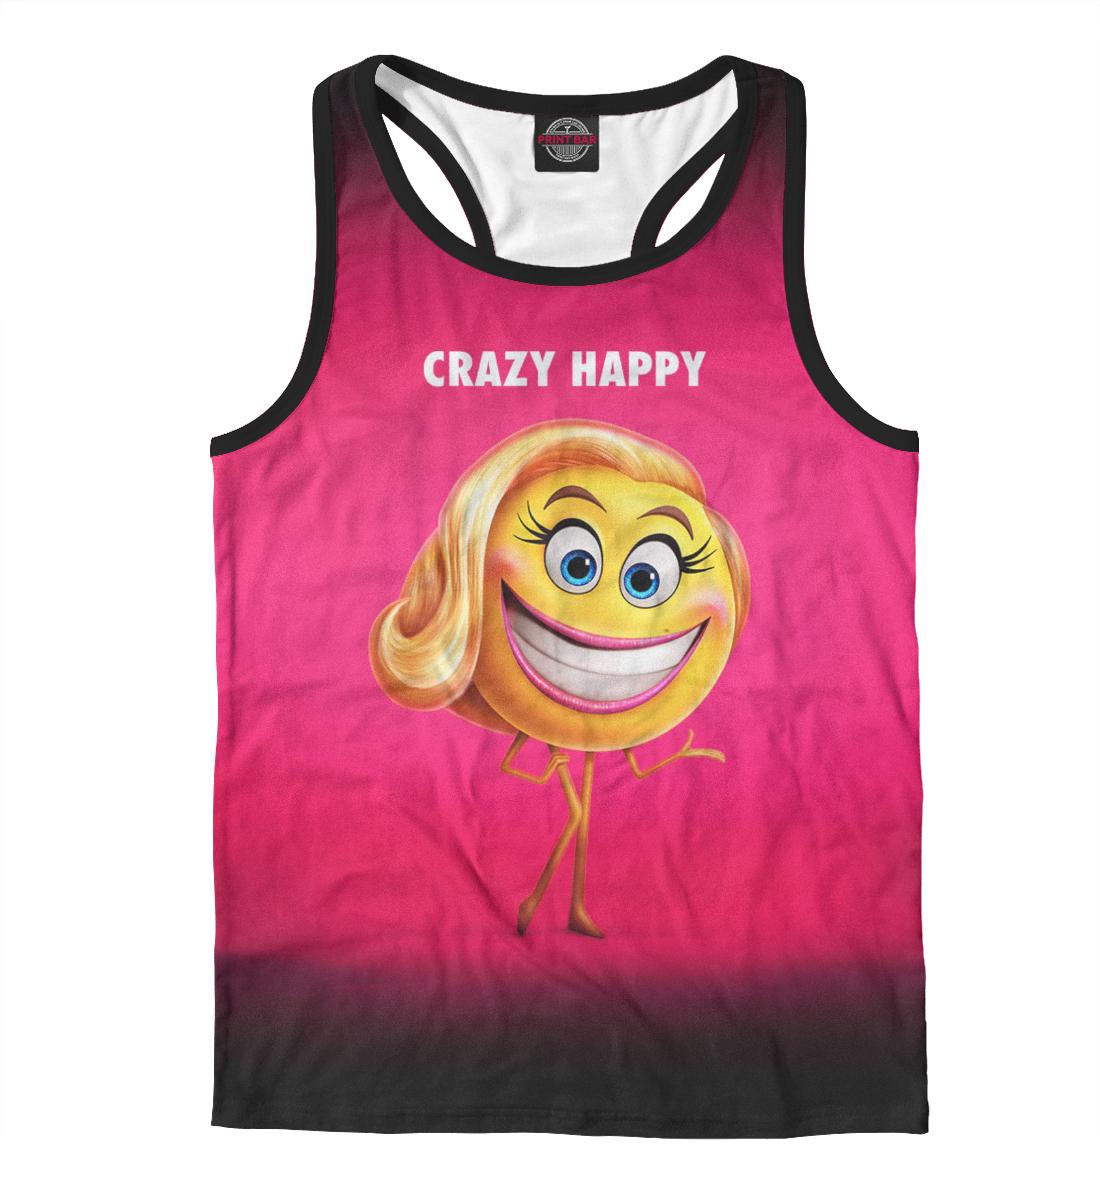 Купить Crazy Happy, Printbar, Майки борцовки, EMJ-645138-mayb-2